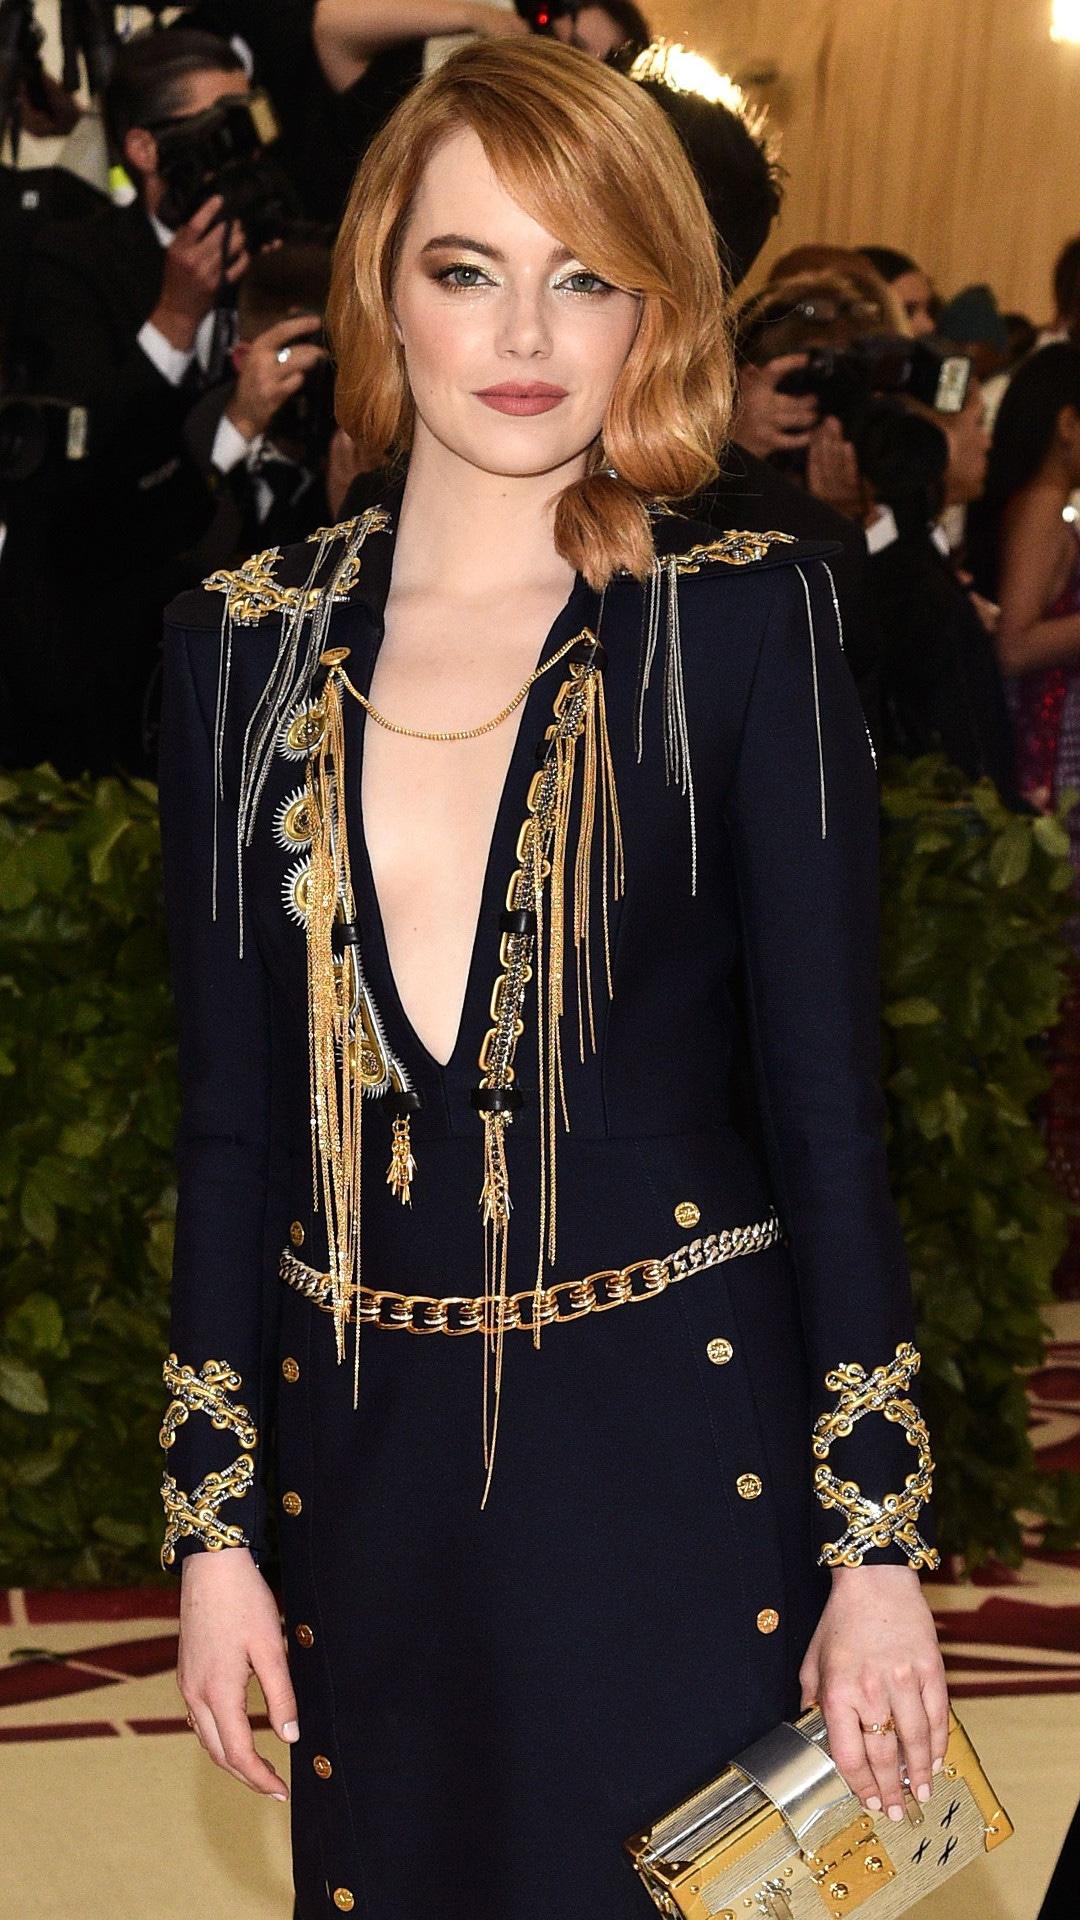 Emma Stone, 2018 Met Gala, Red Carpet Fashions